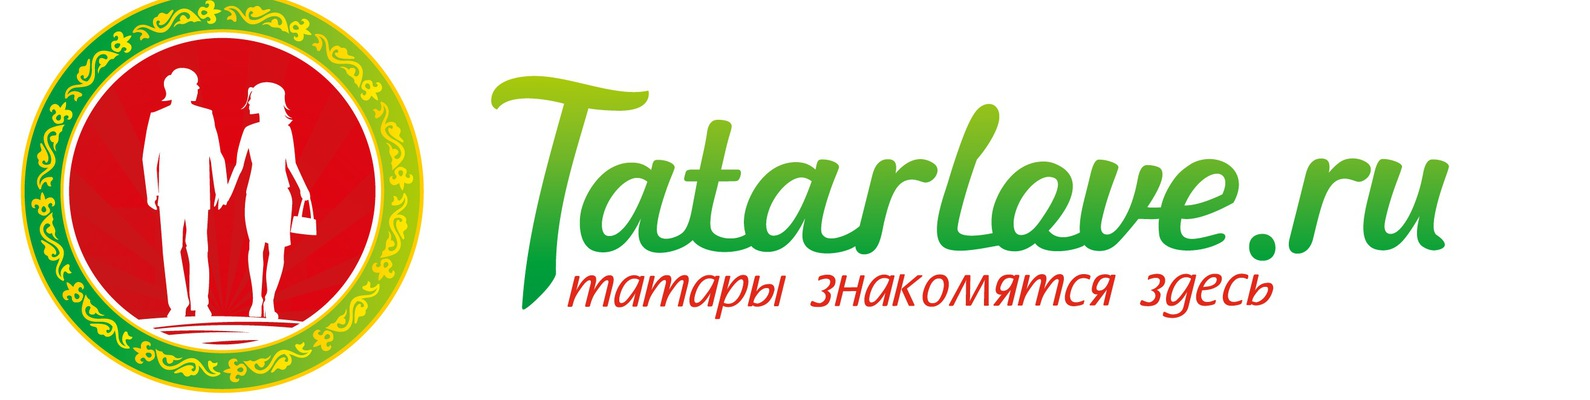 Татарлава Сайт Знакомств